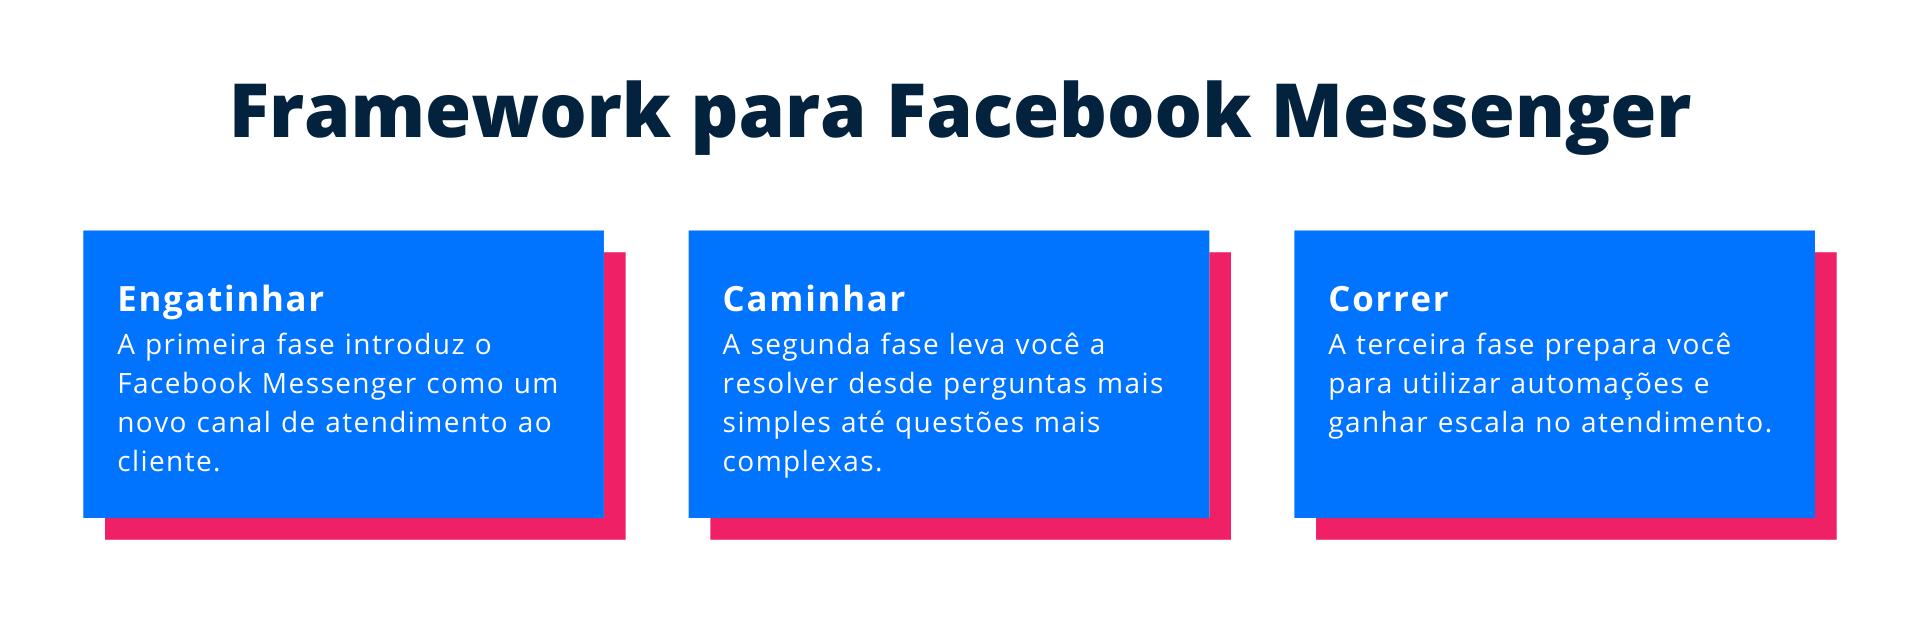 Facebook Framework